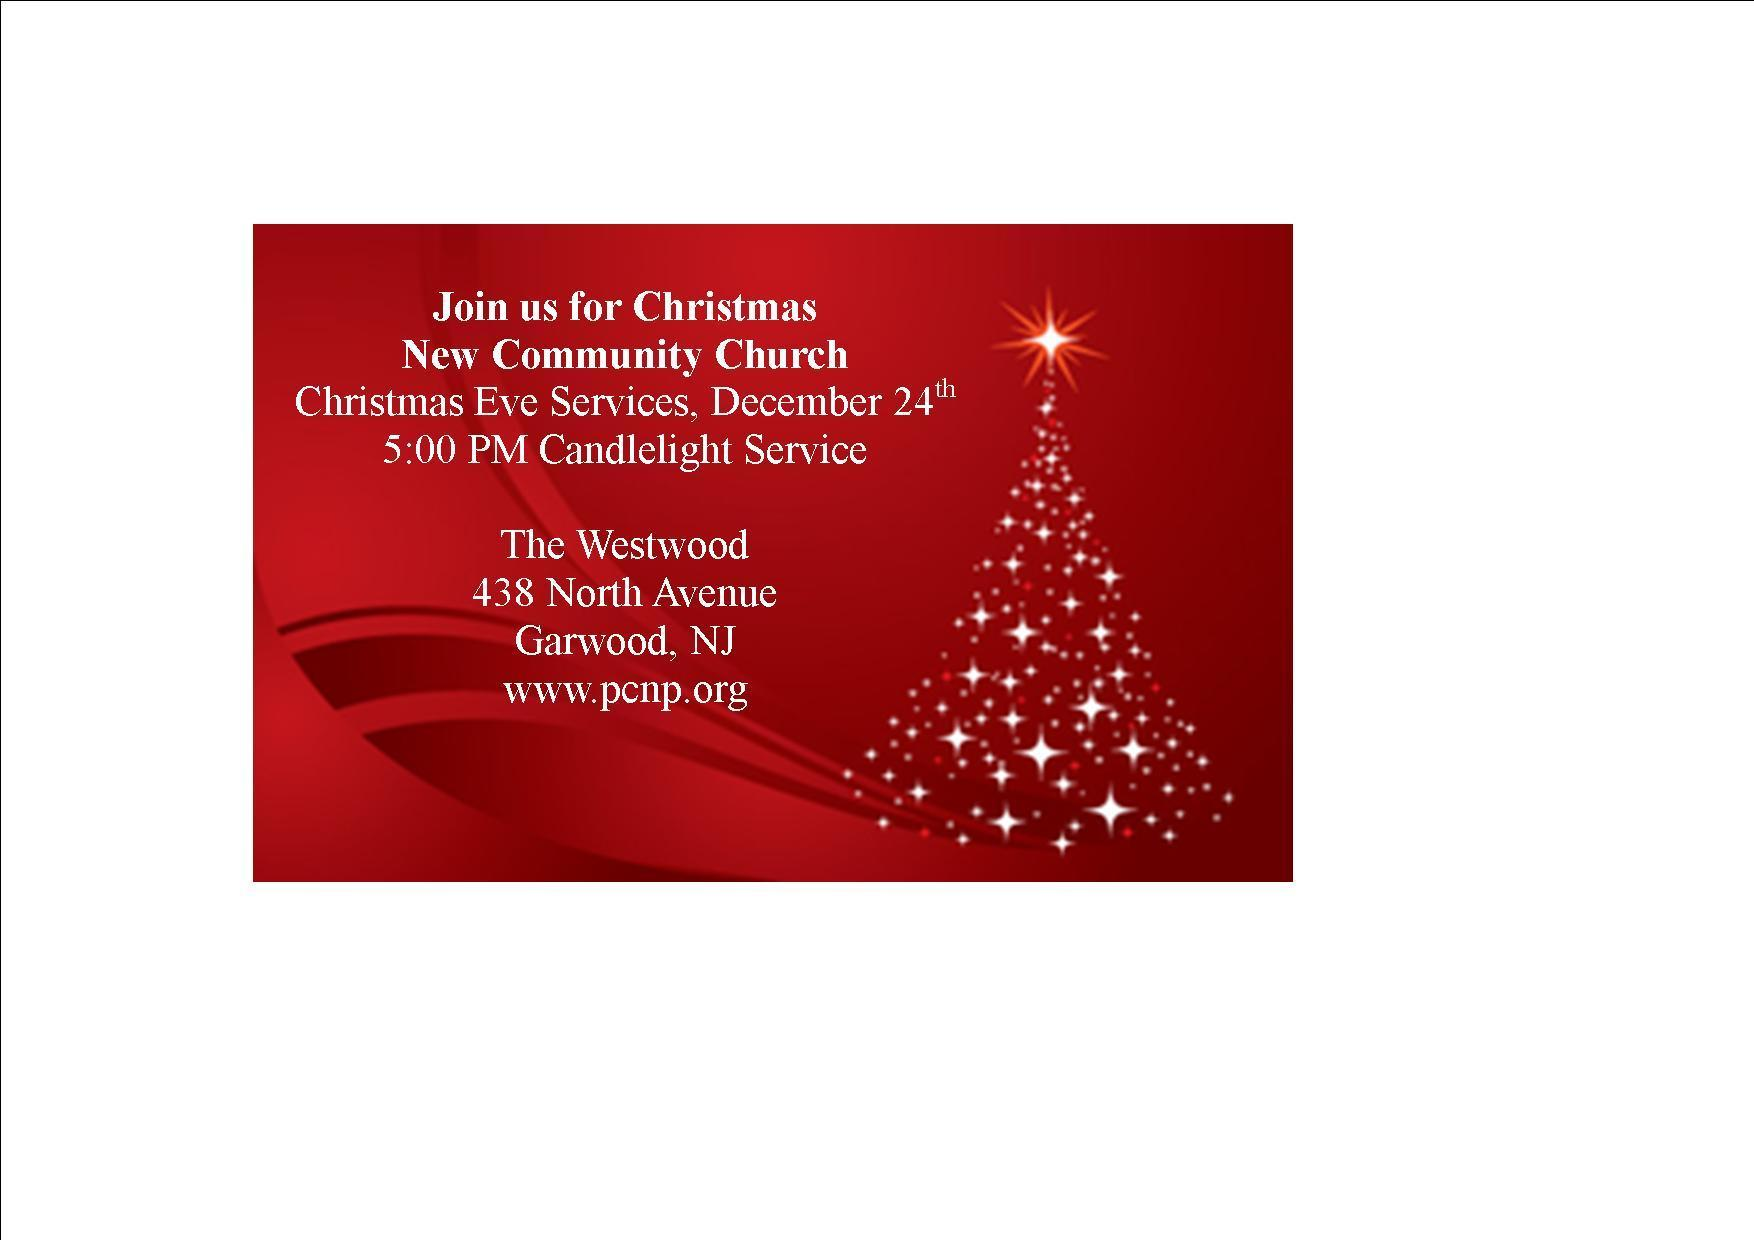 a232a4cabfcb1b14bf6a_NCC_Christmas_Eve_info.jpg